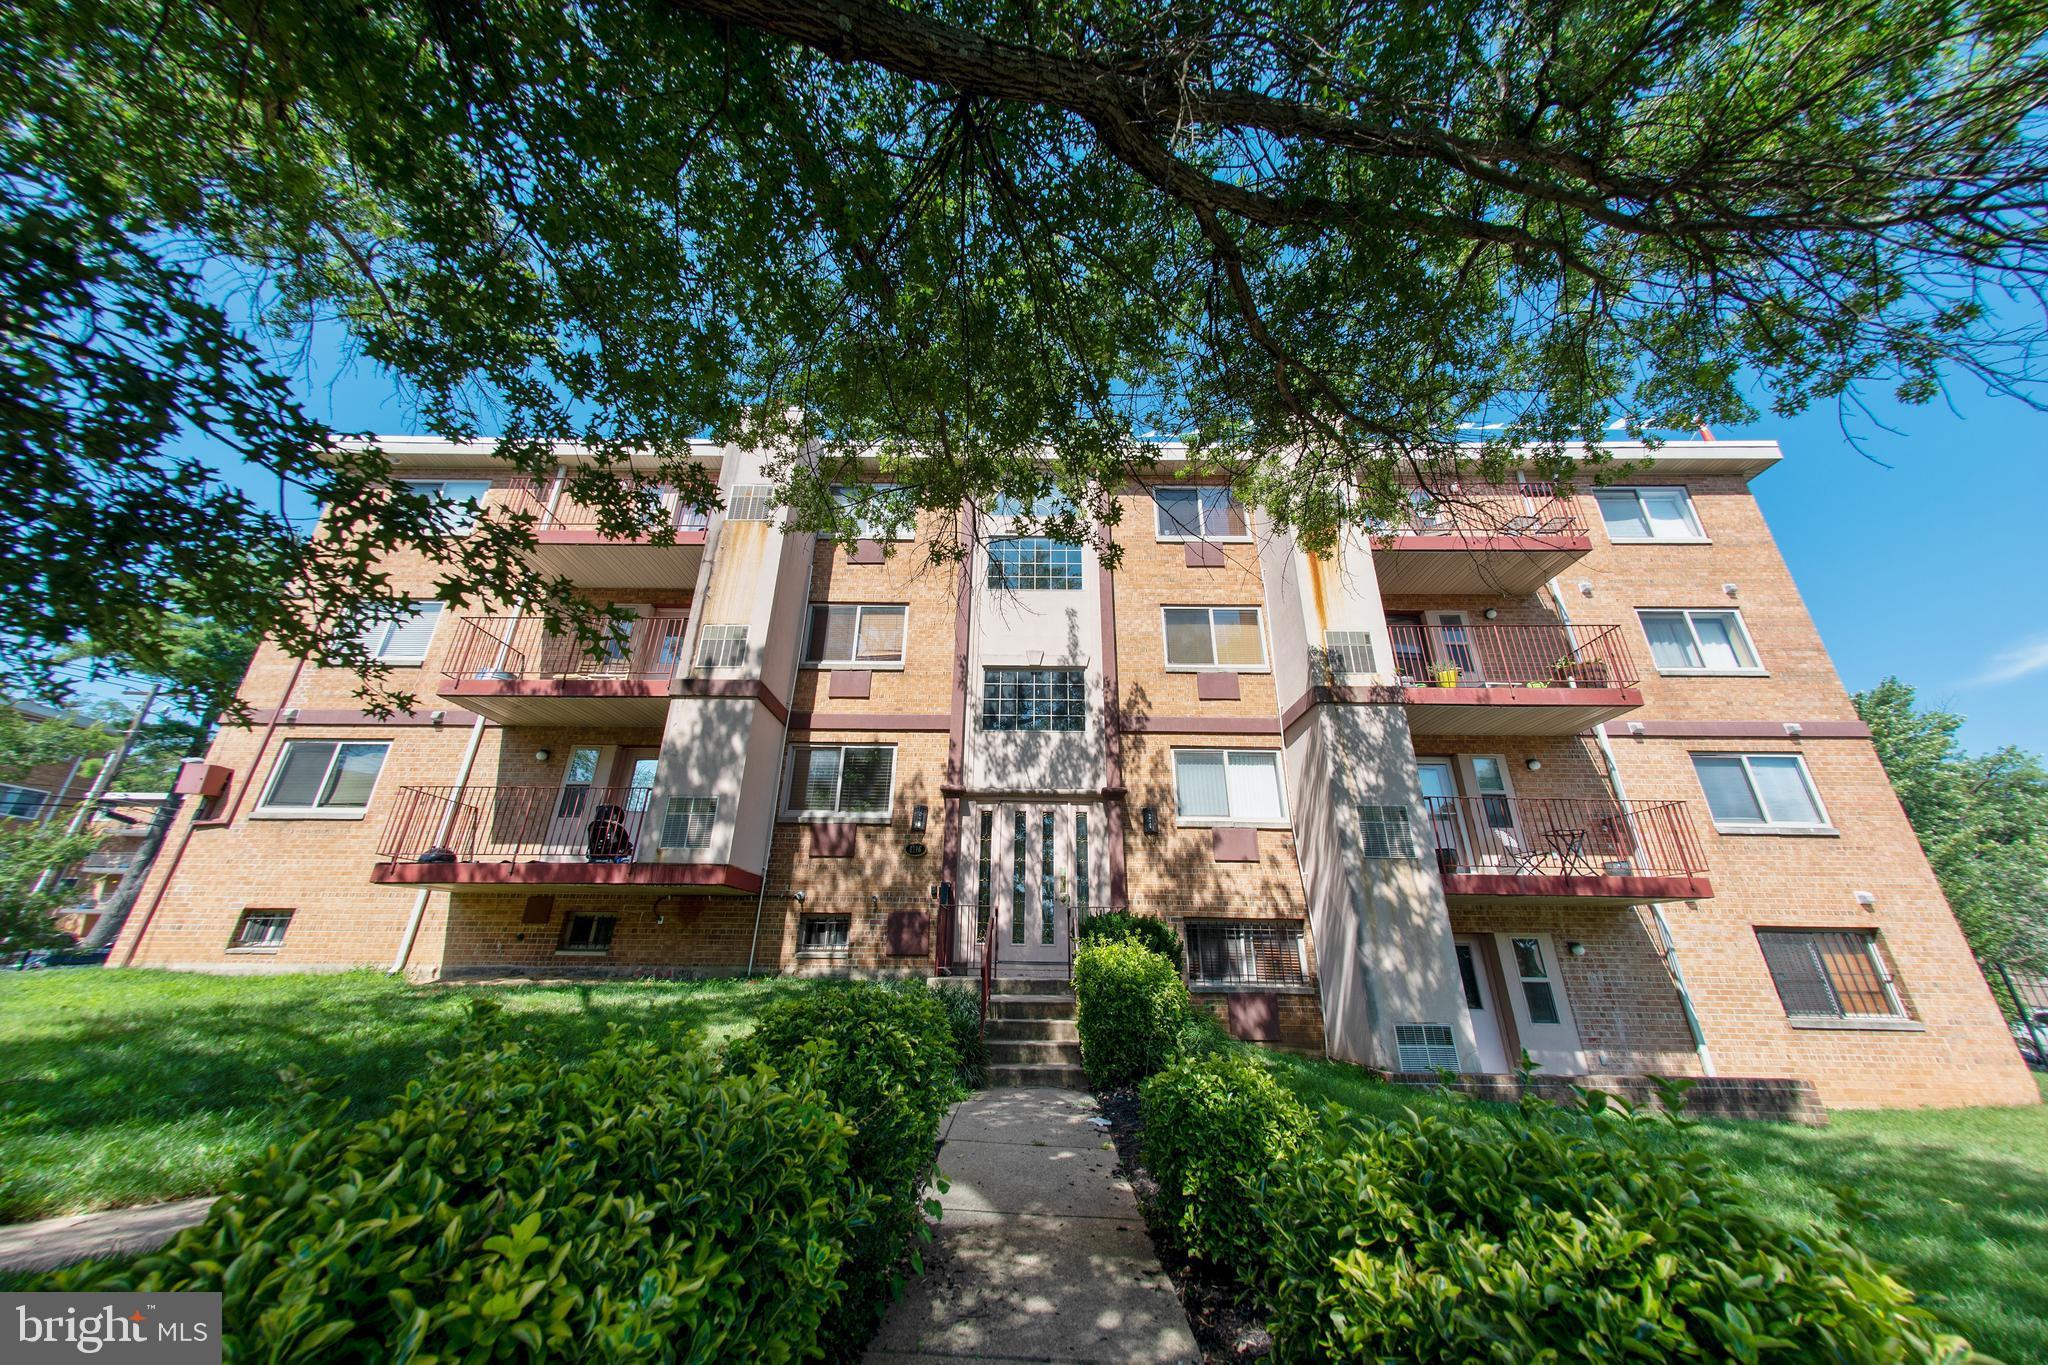 4116 Ames Street NE #202, Washington, DC 20019 now has a new price of $187,000!